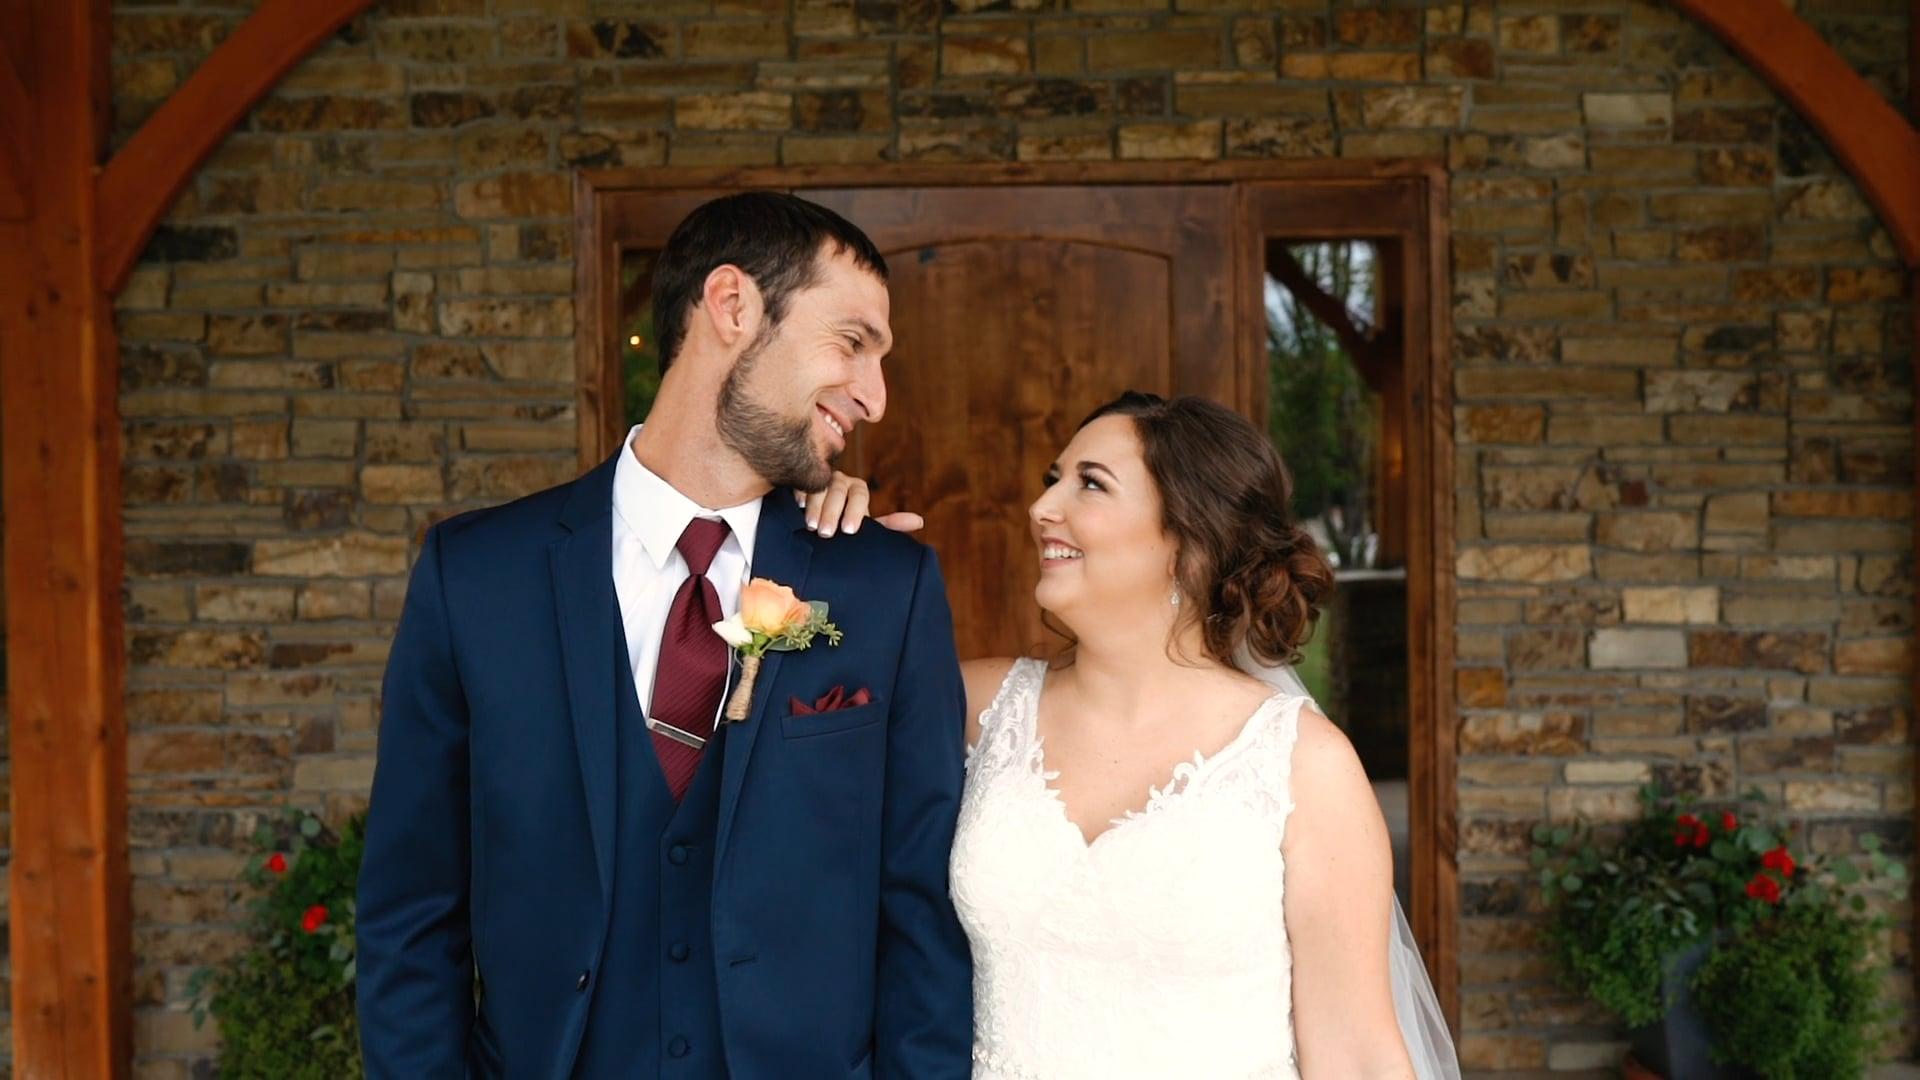 Liz & Seth | The Highlight